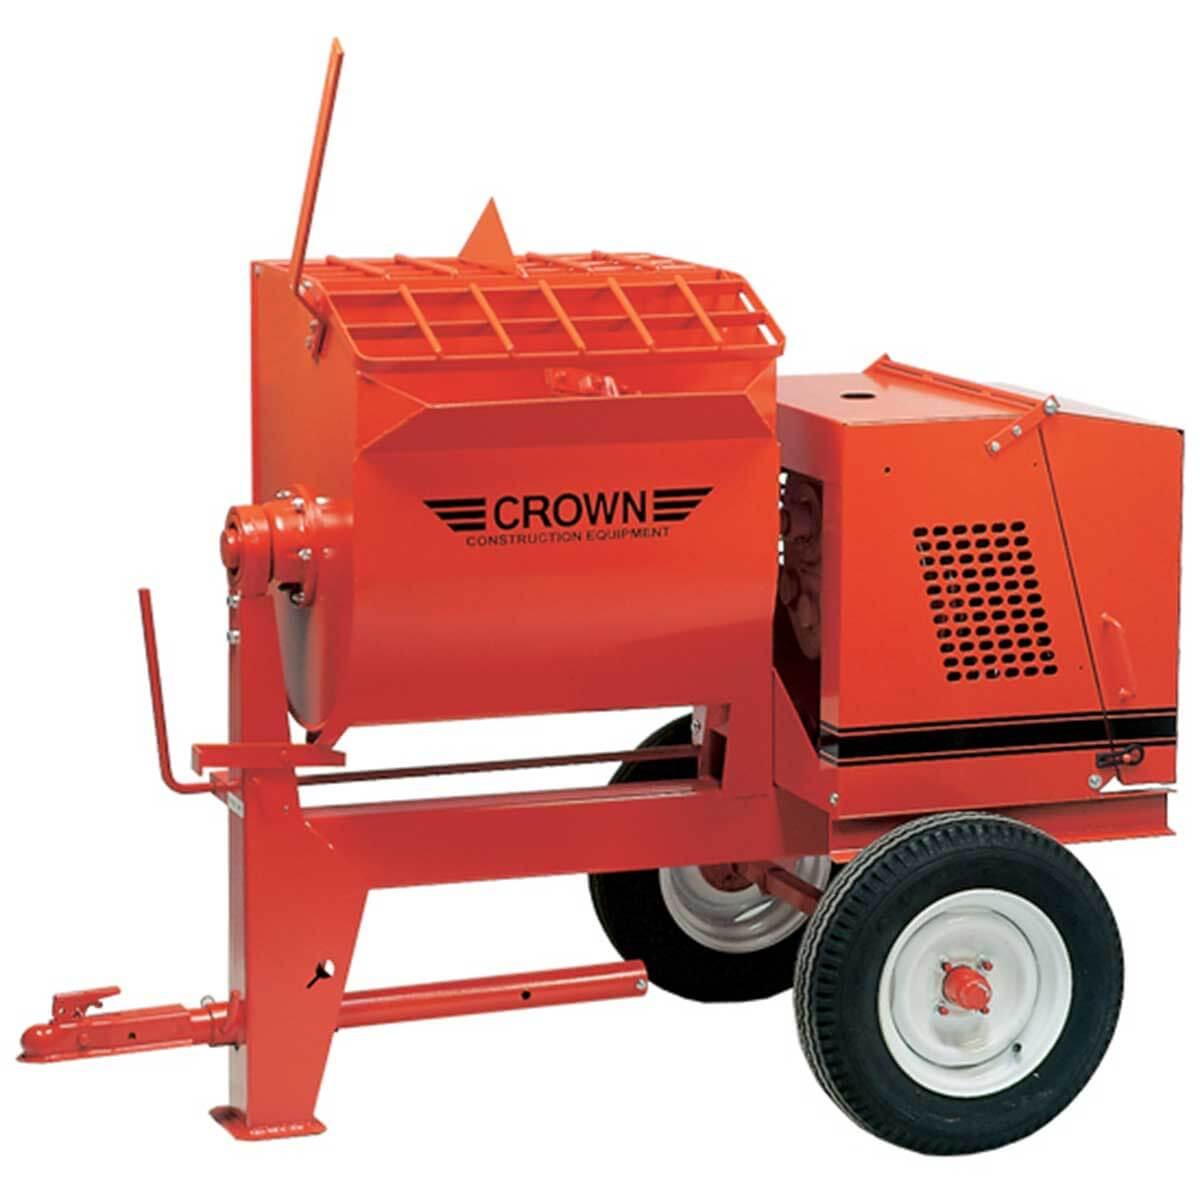 Crown 6SR Towable Mortar Mixer